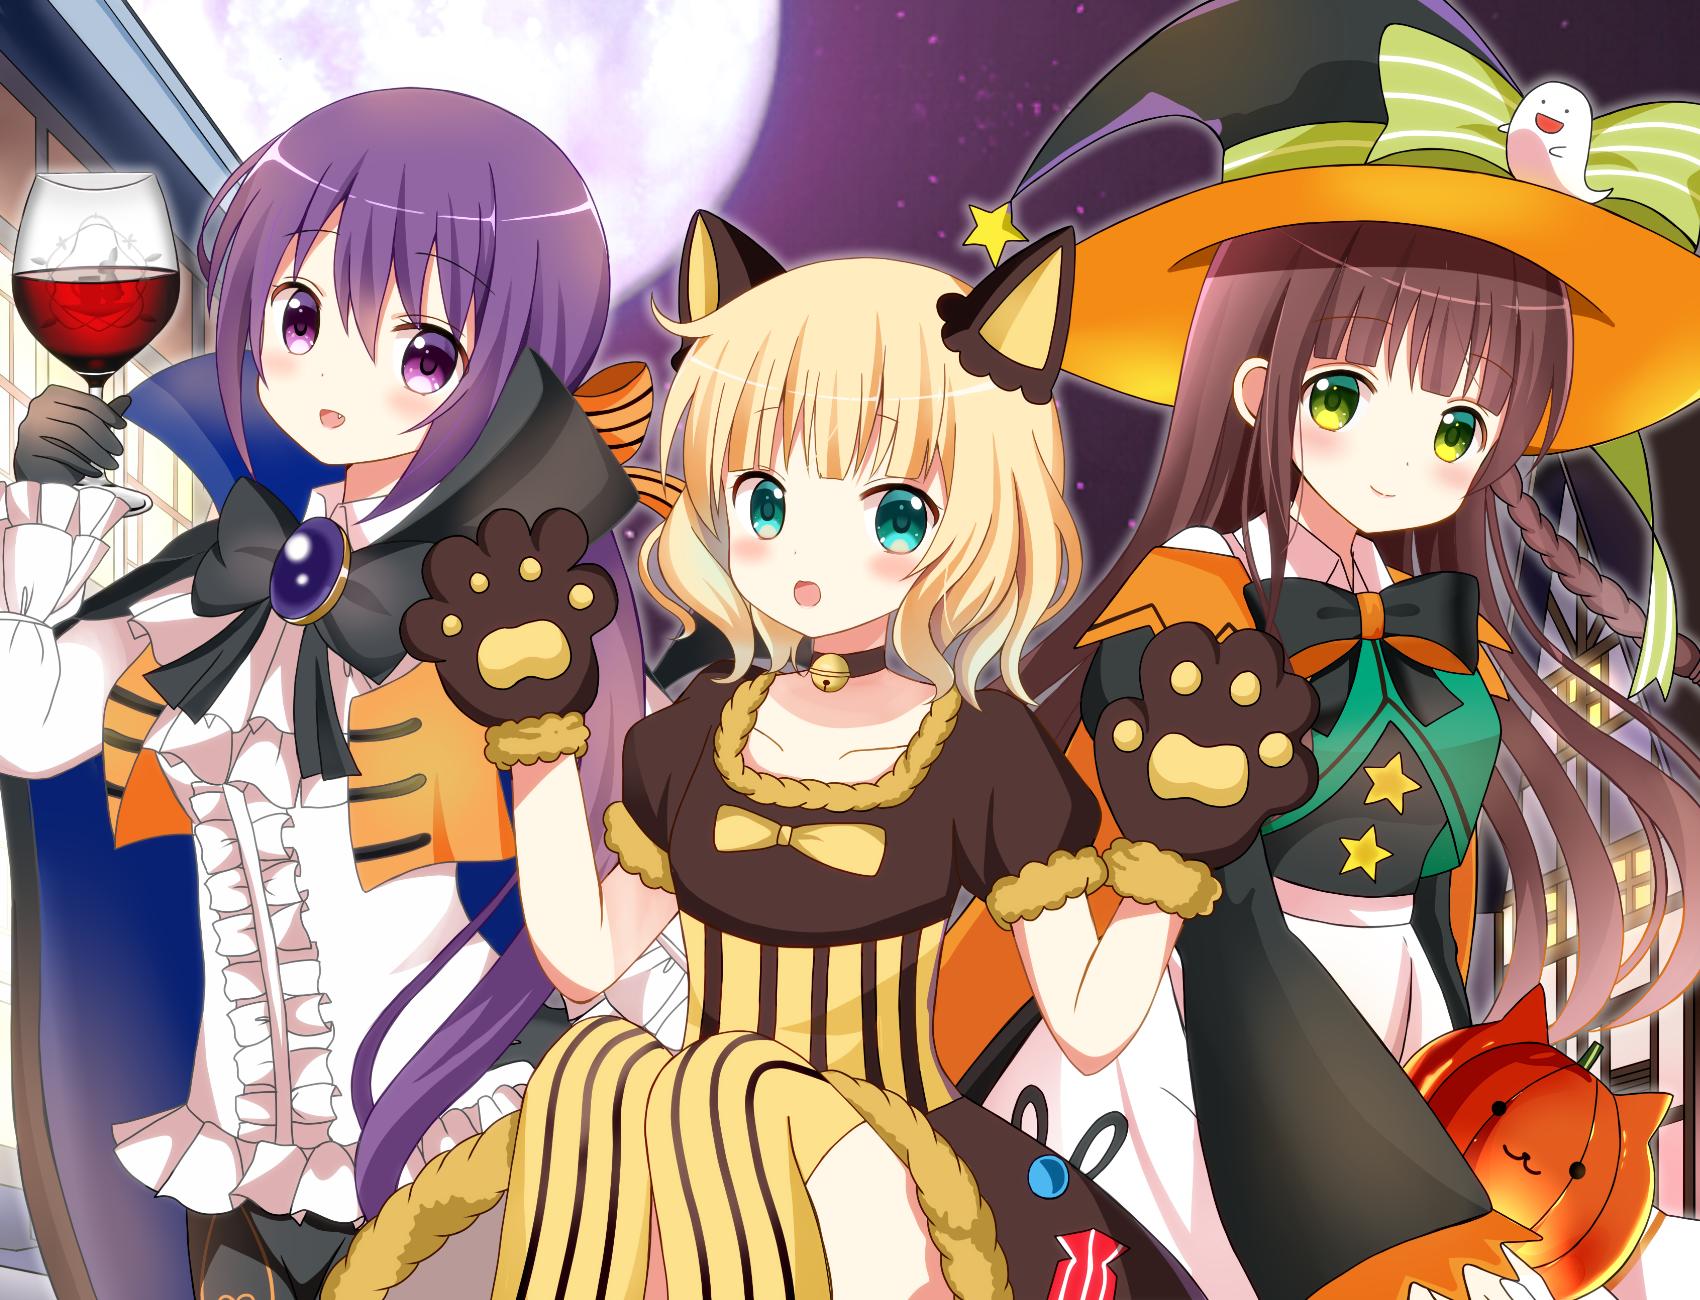 Halloween is early. [Gochuumon wa Usagi Desu ka?]  awwnime